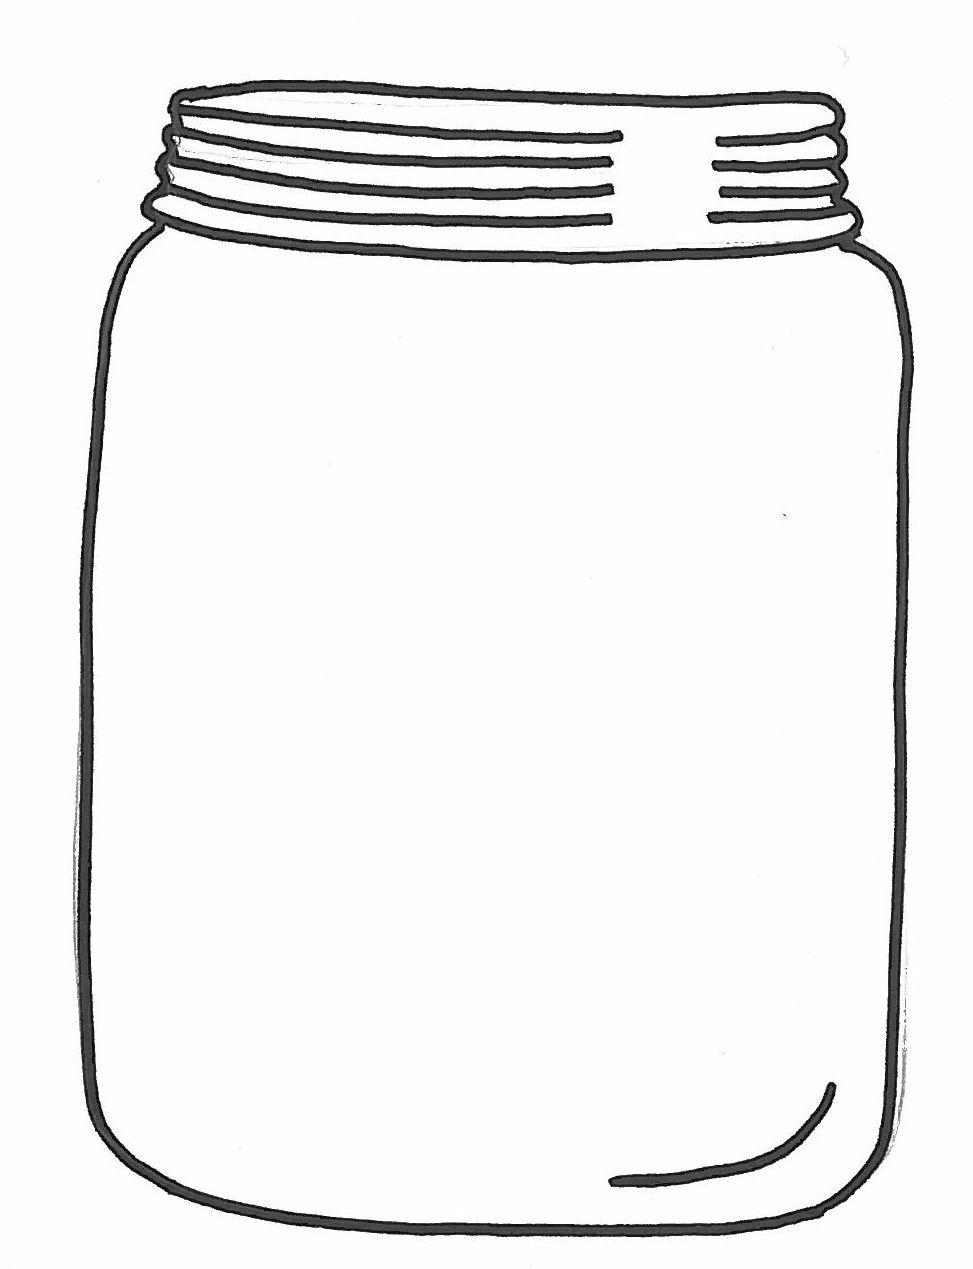 Cookie Jar Clipart   Free download best Cookie Jar Clipart on ...